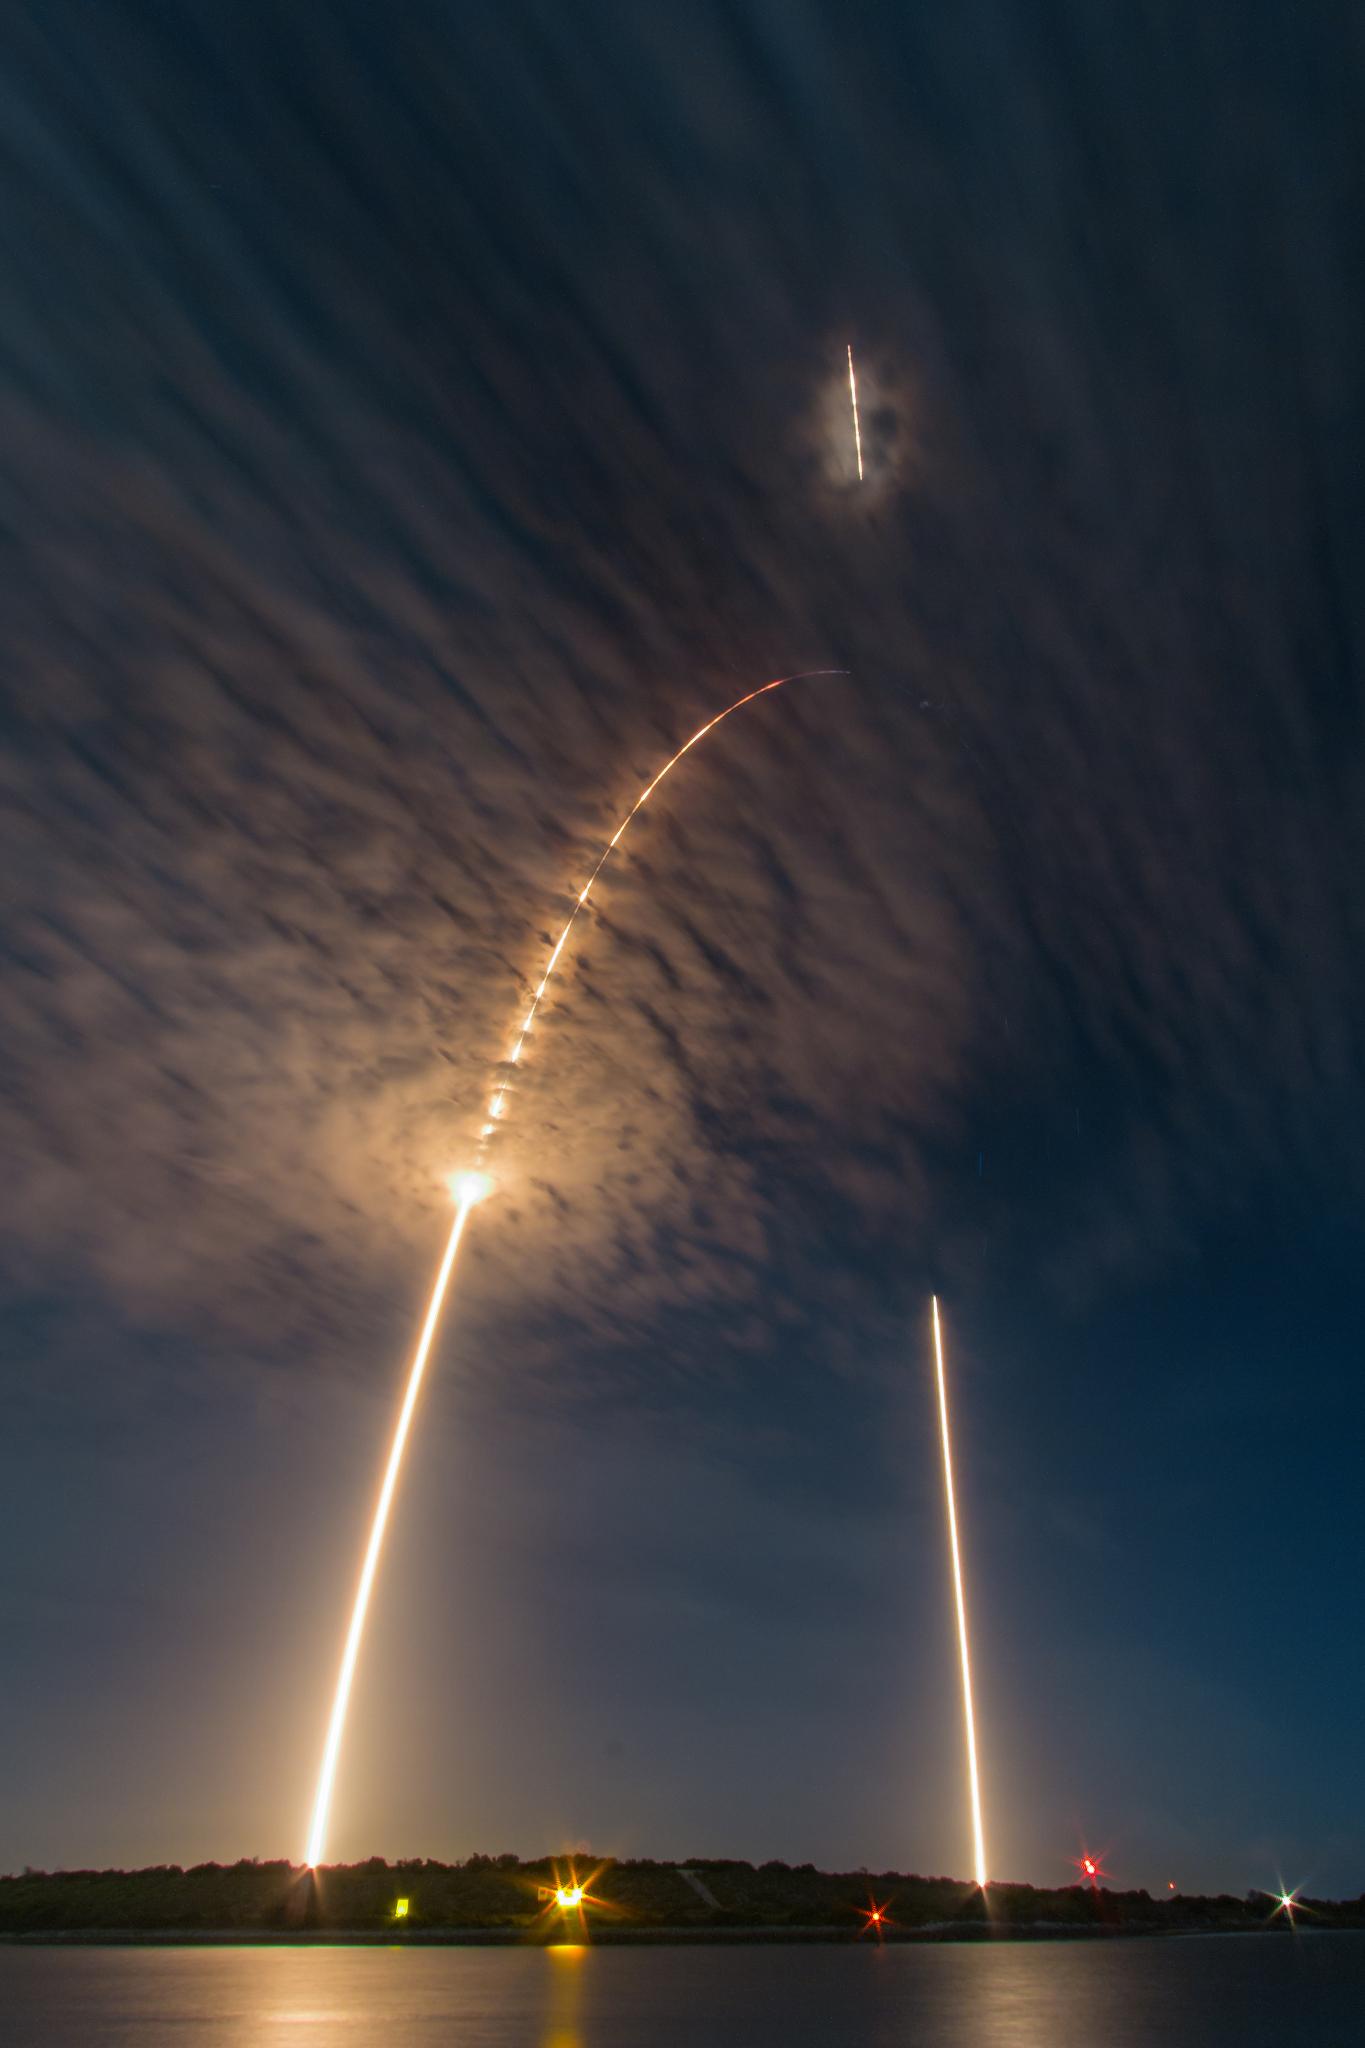 Hunter X Hunter Wallpaper Iphone Apod 2016 July 21 Falcon 9 Launch And Landing